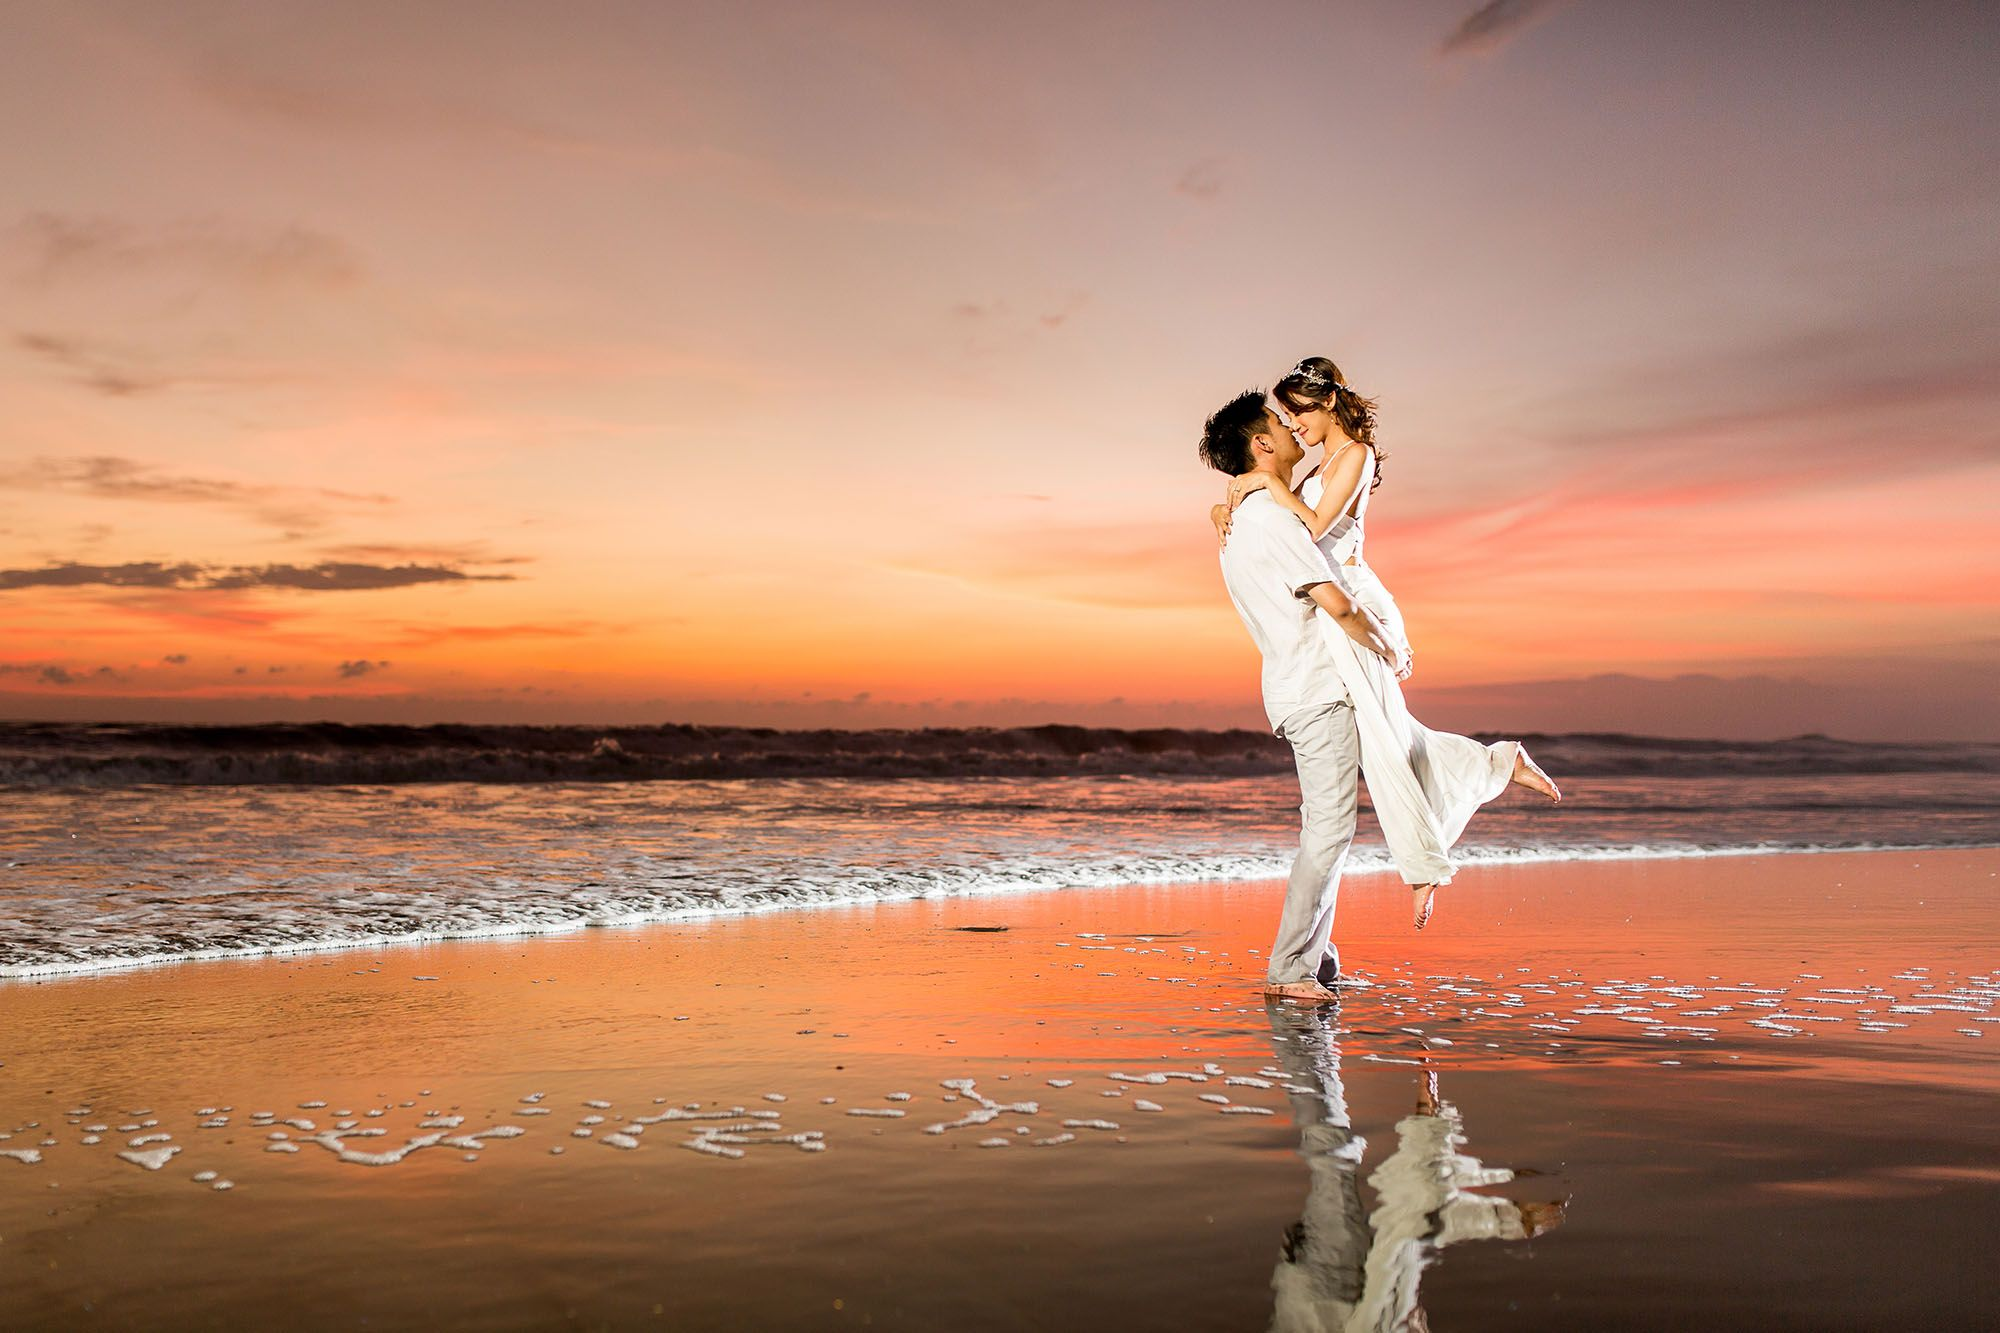 After Sunset Sunset Bali Prewedding By Bali Pixtura Bali Wedding